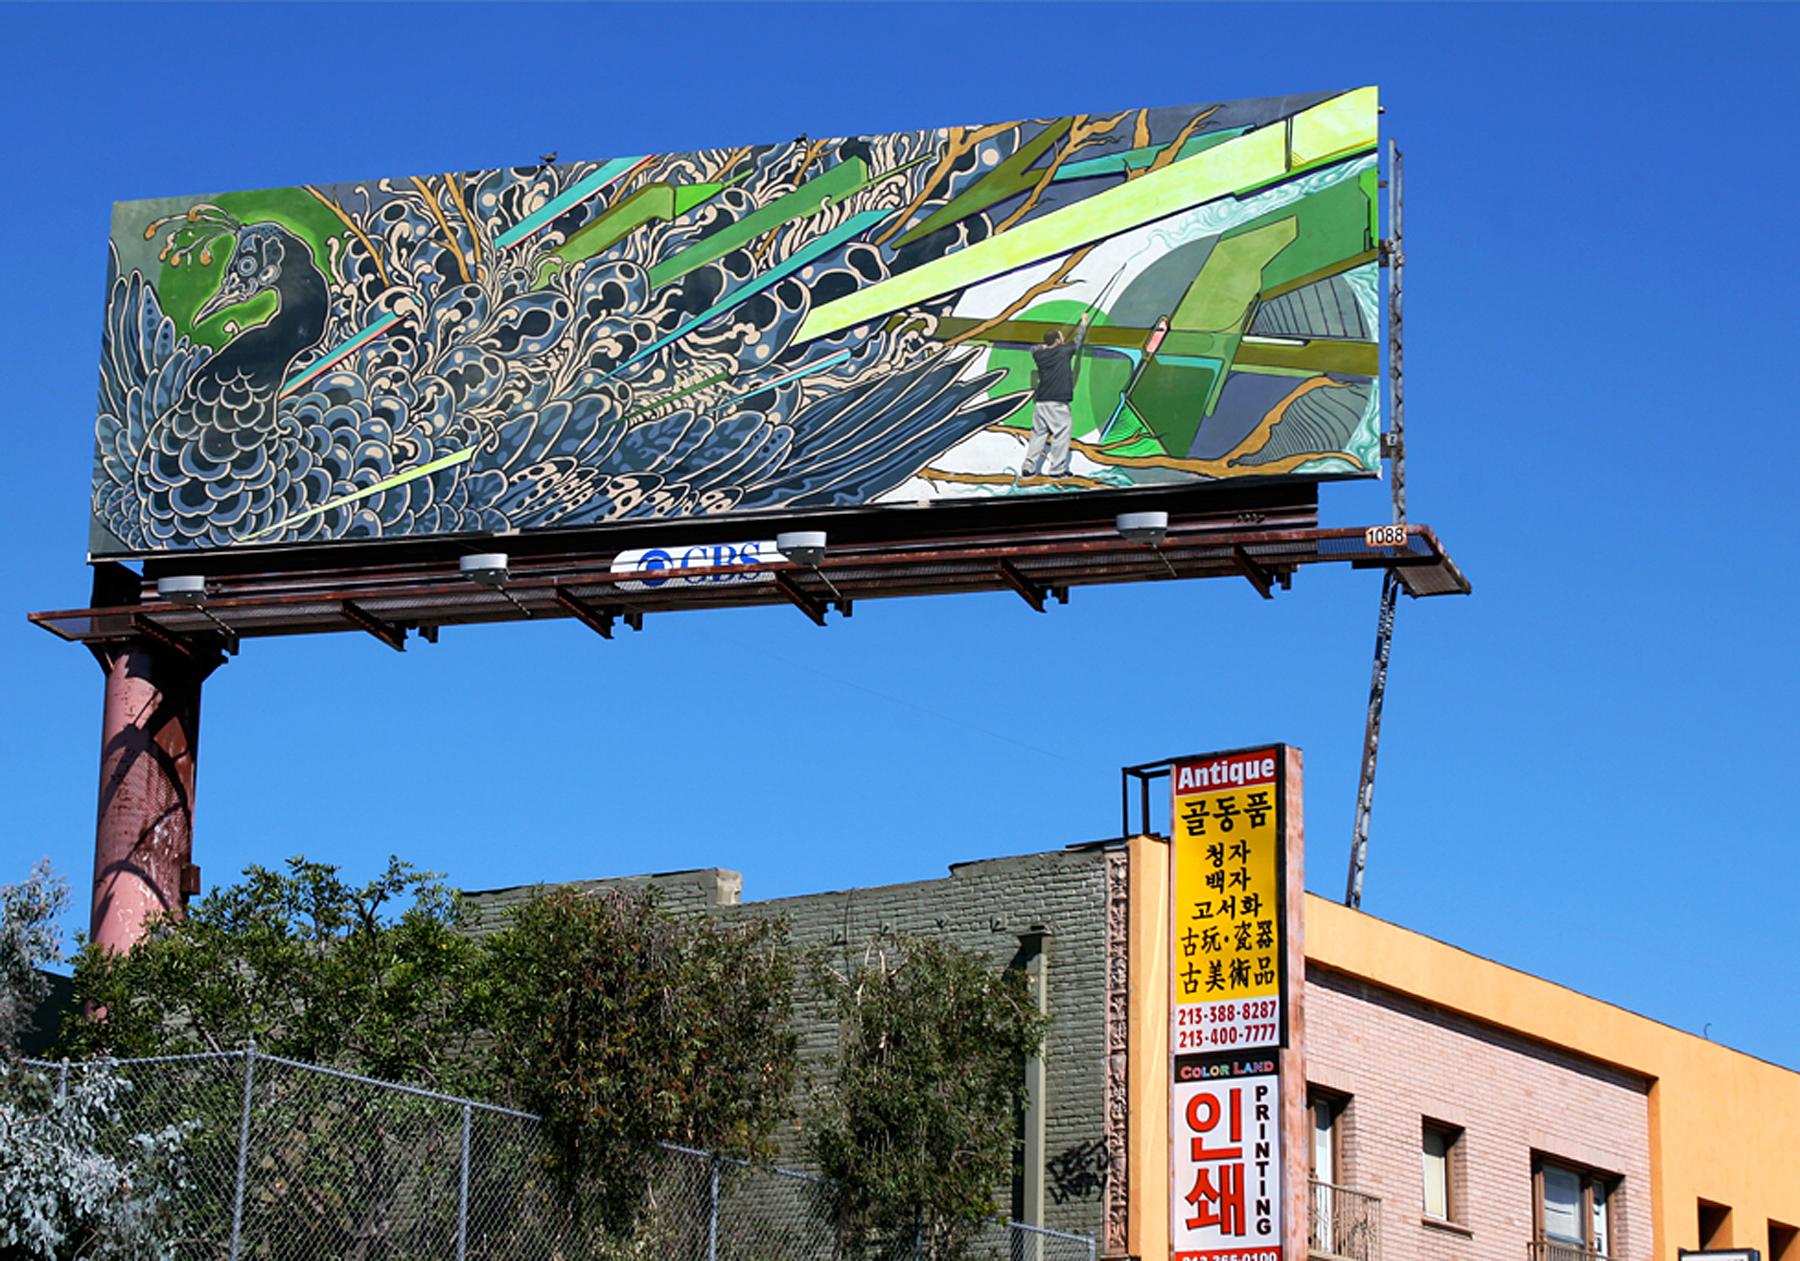 Christopher Brand, Evan Skrederstu, Steve Martinez, Jose Lopez.  #PublicWorks Billboard Project. 2012.